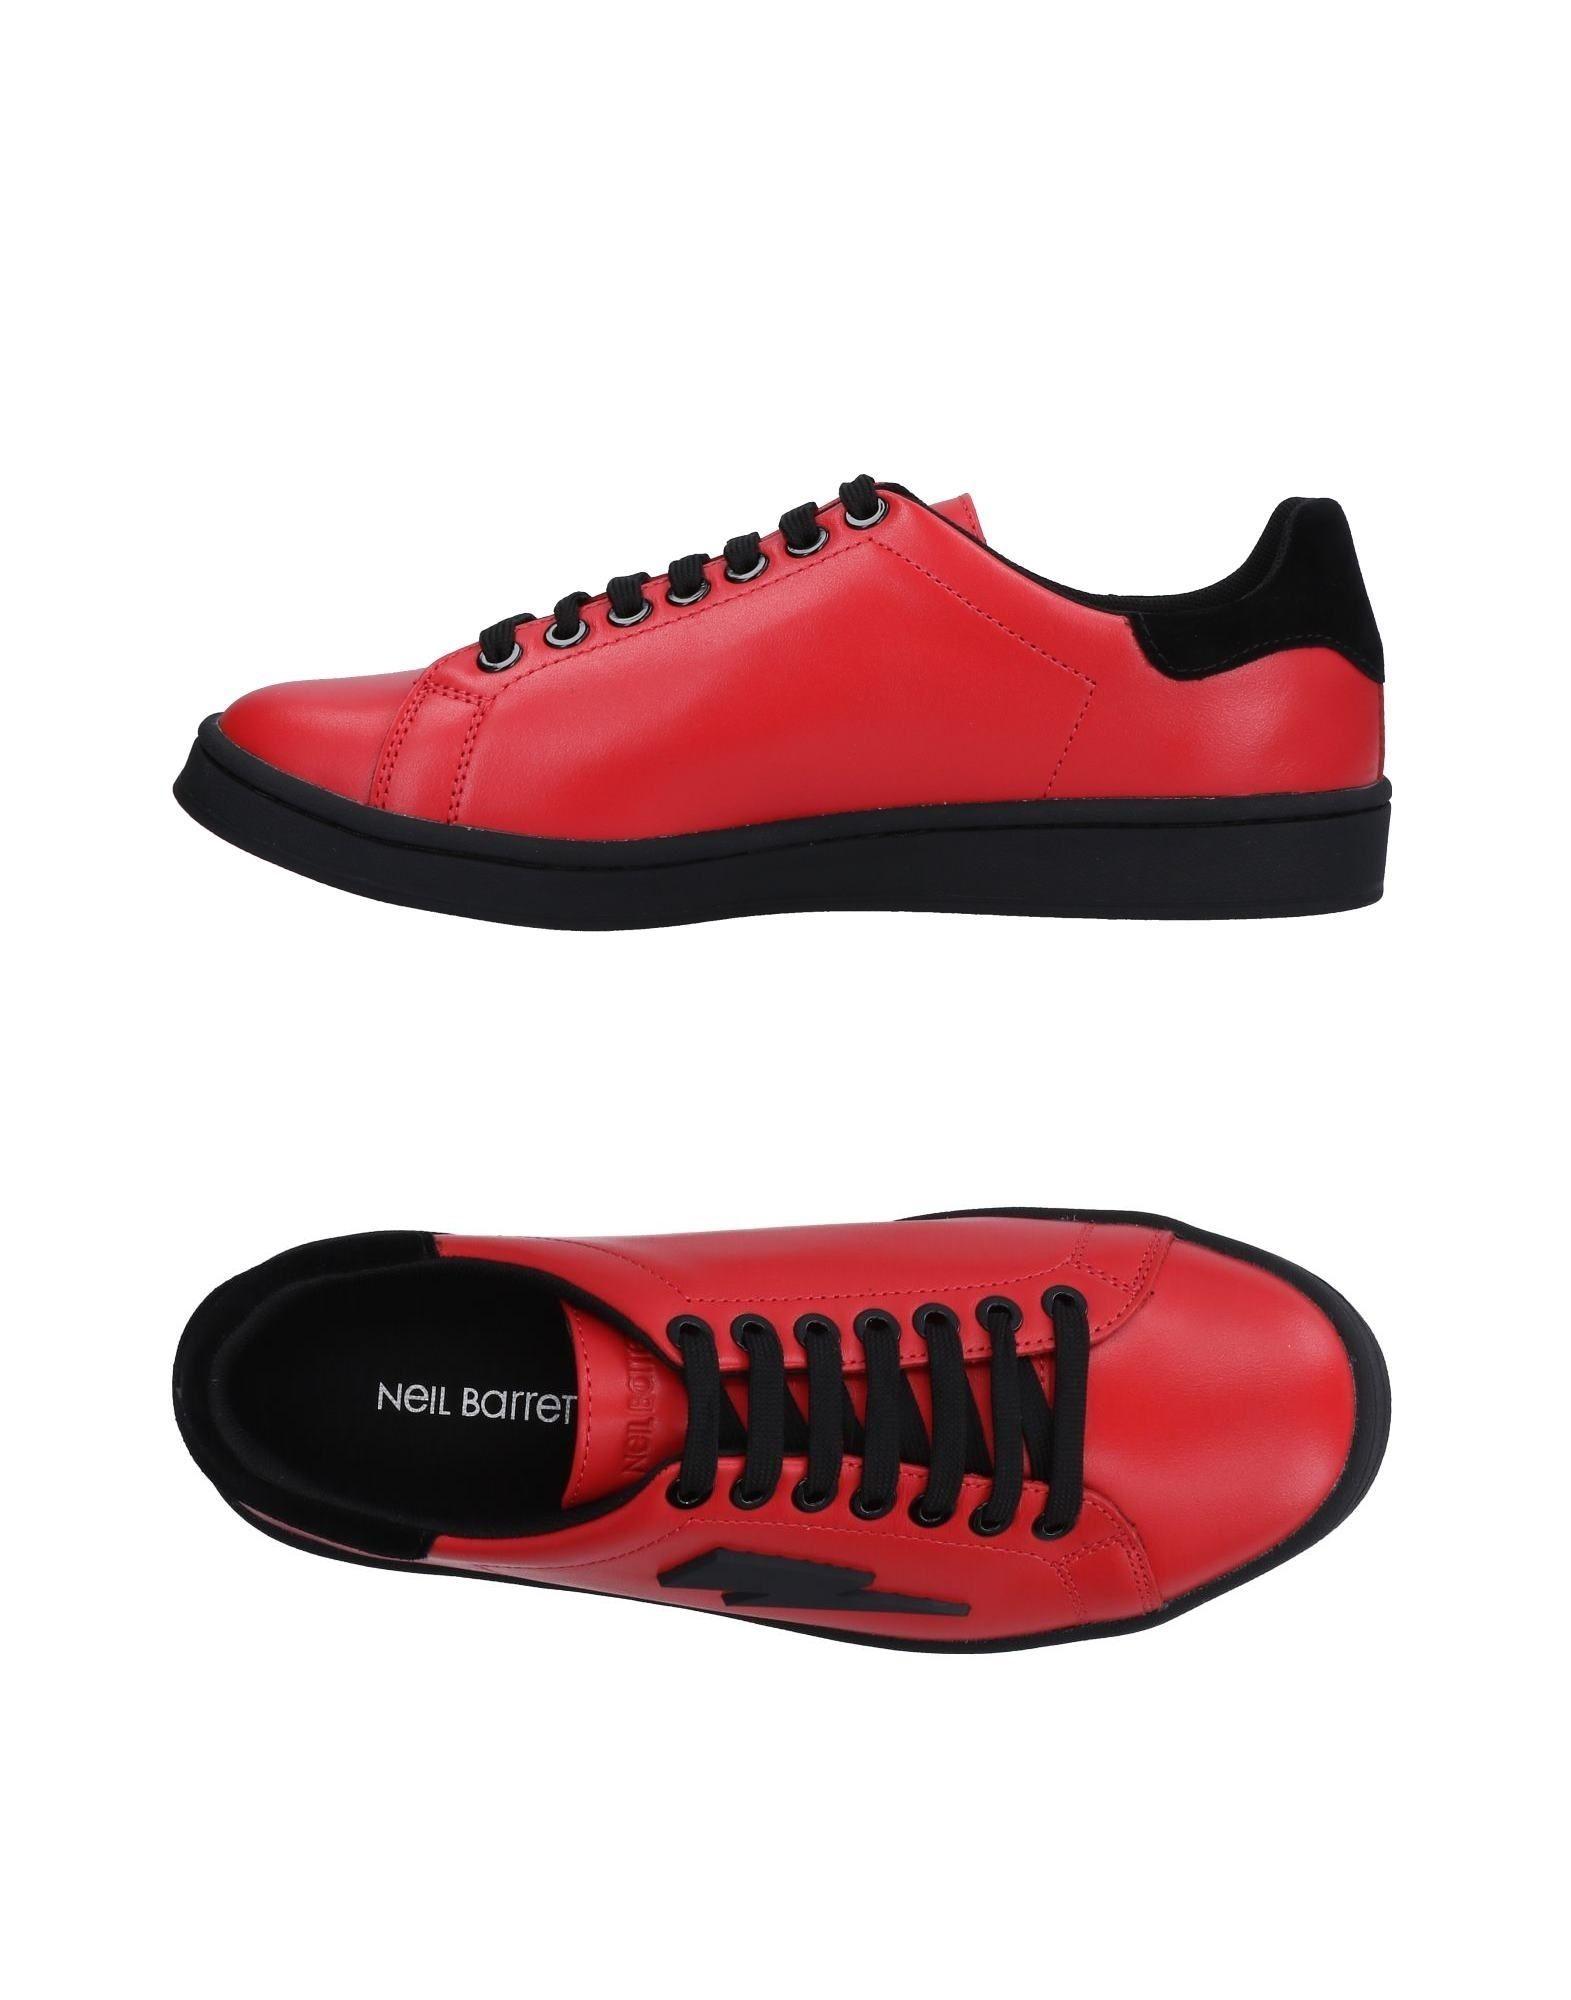 Neil Barrett Sneakers Herren  11522376PG Gute Qualität beliebte Schuhe